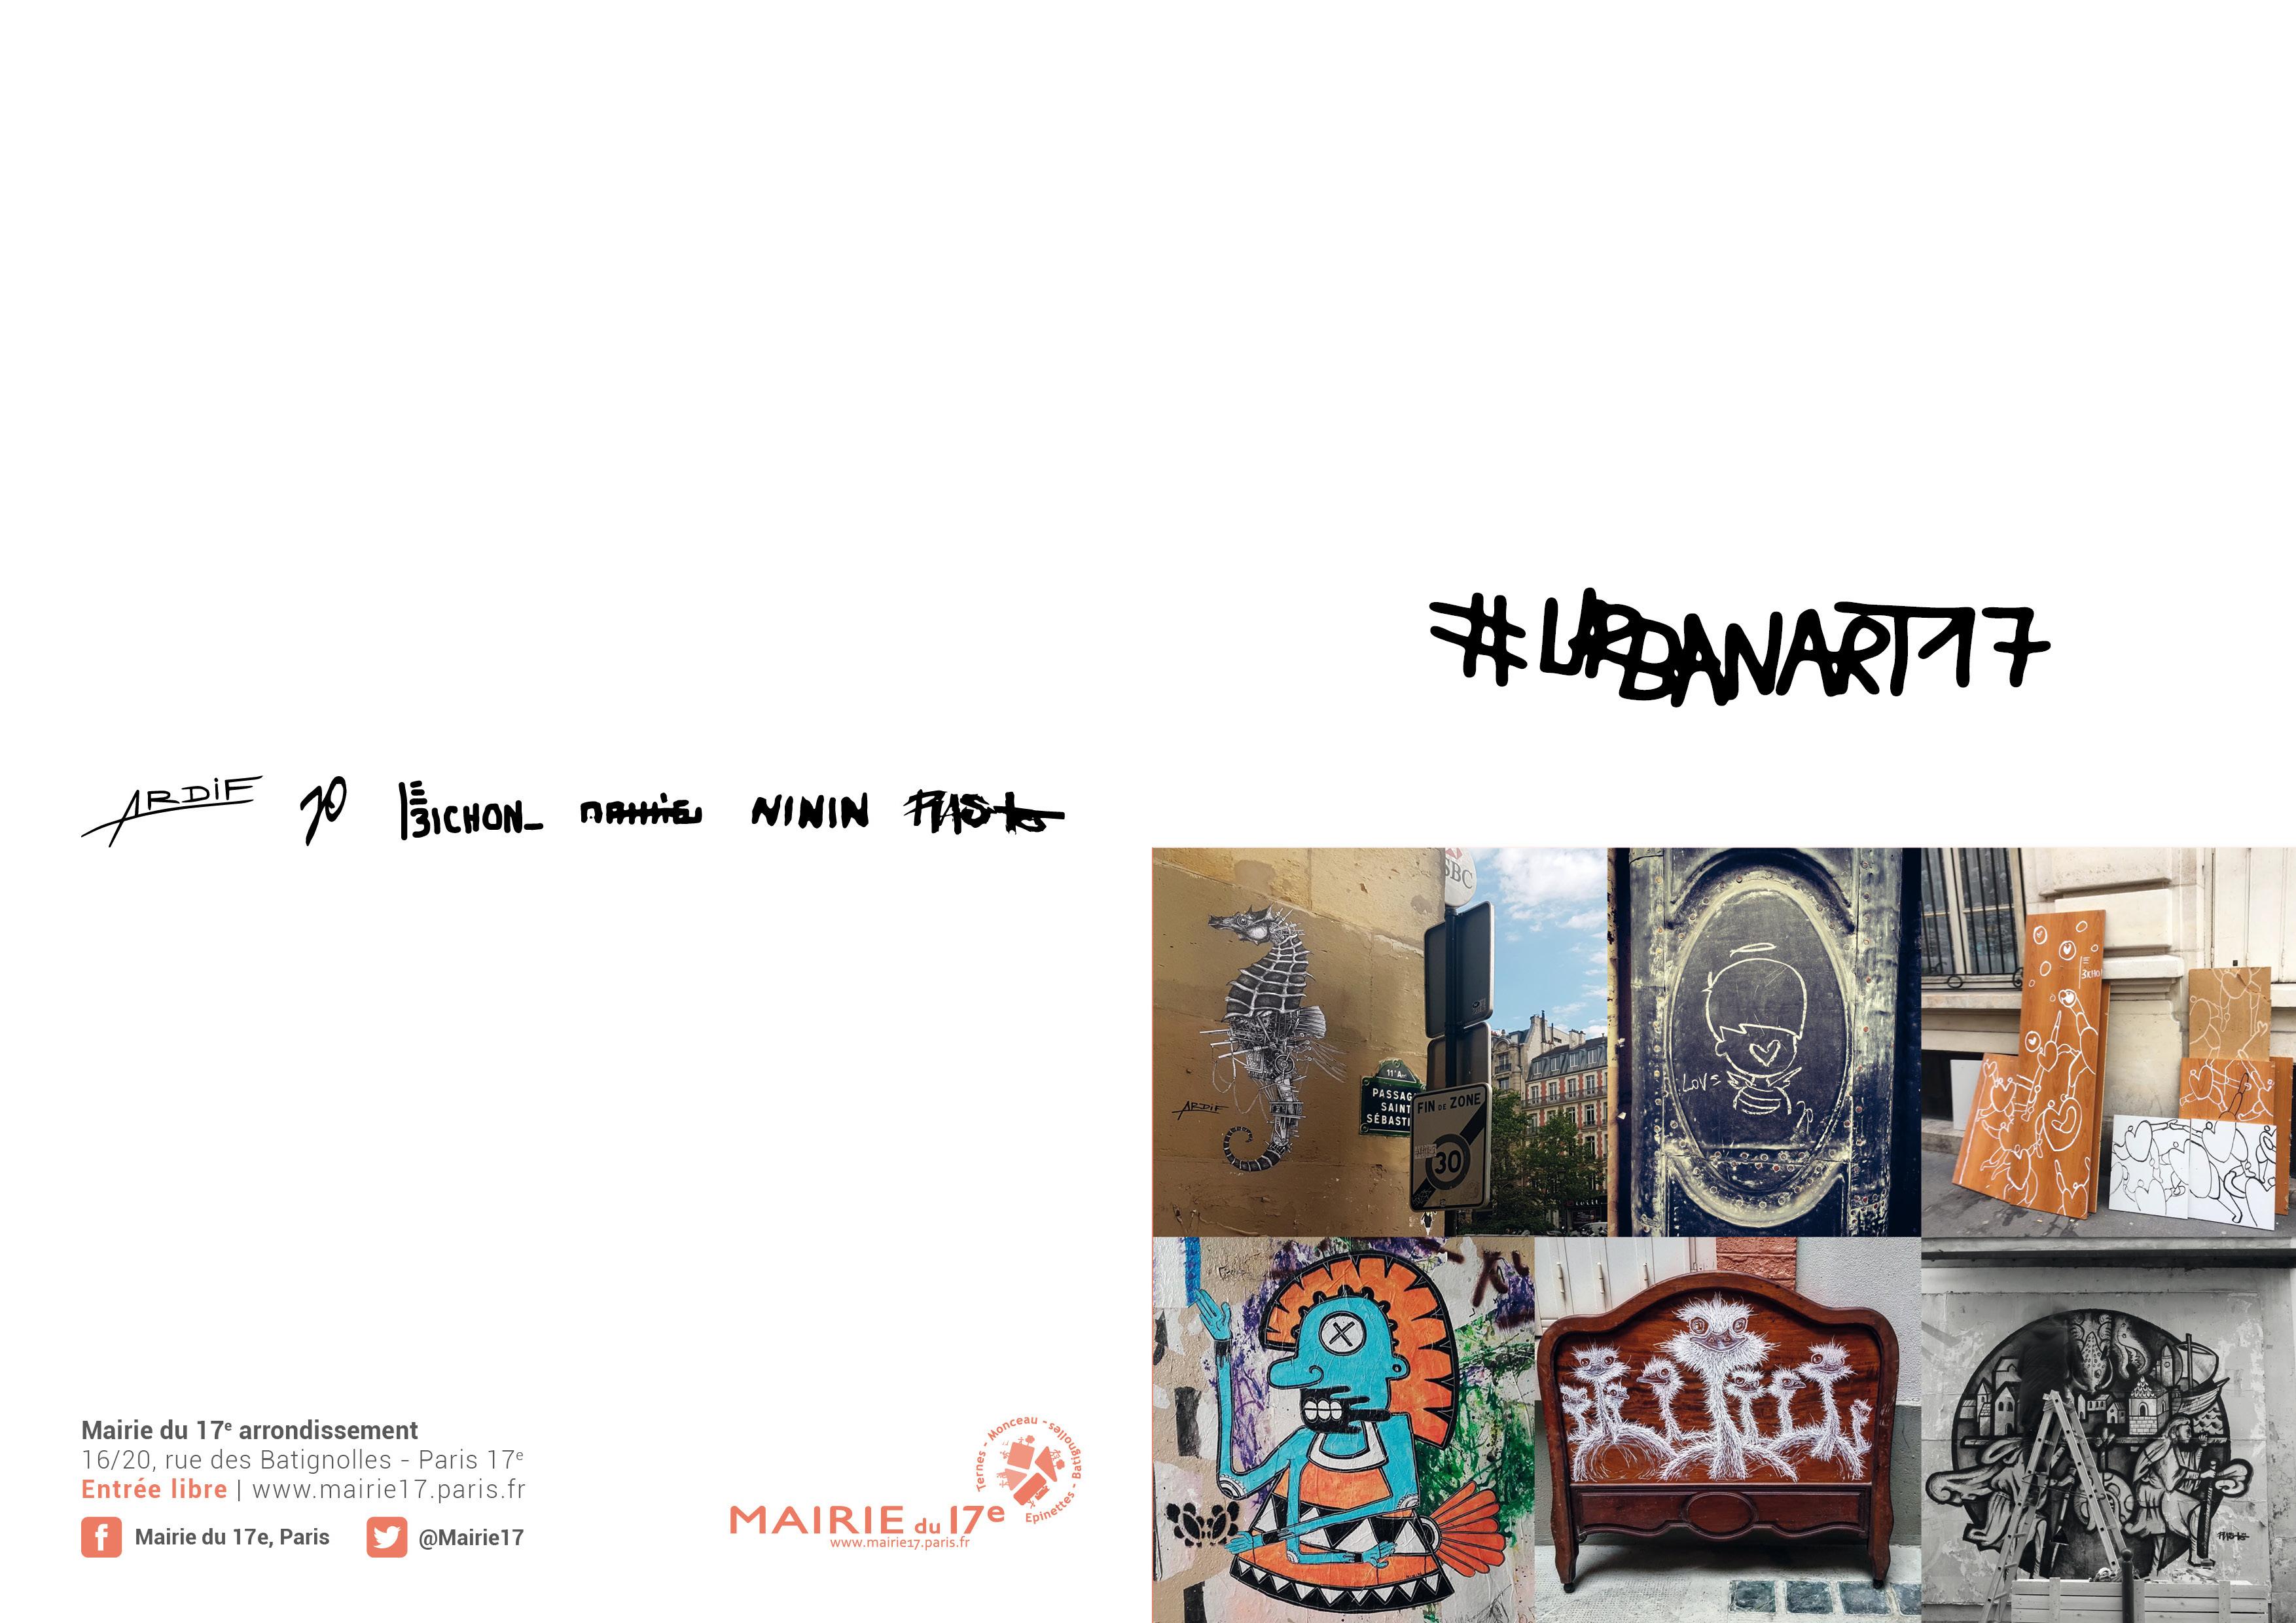 invitation-urbanart-1